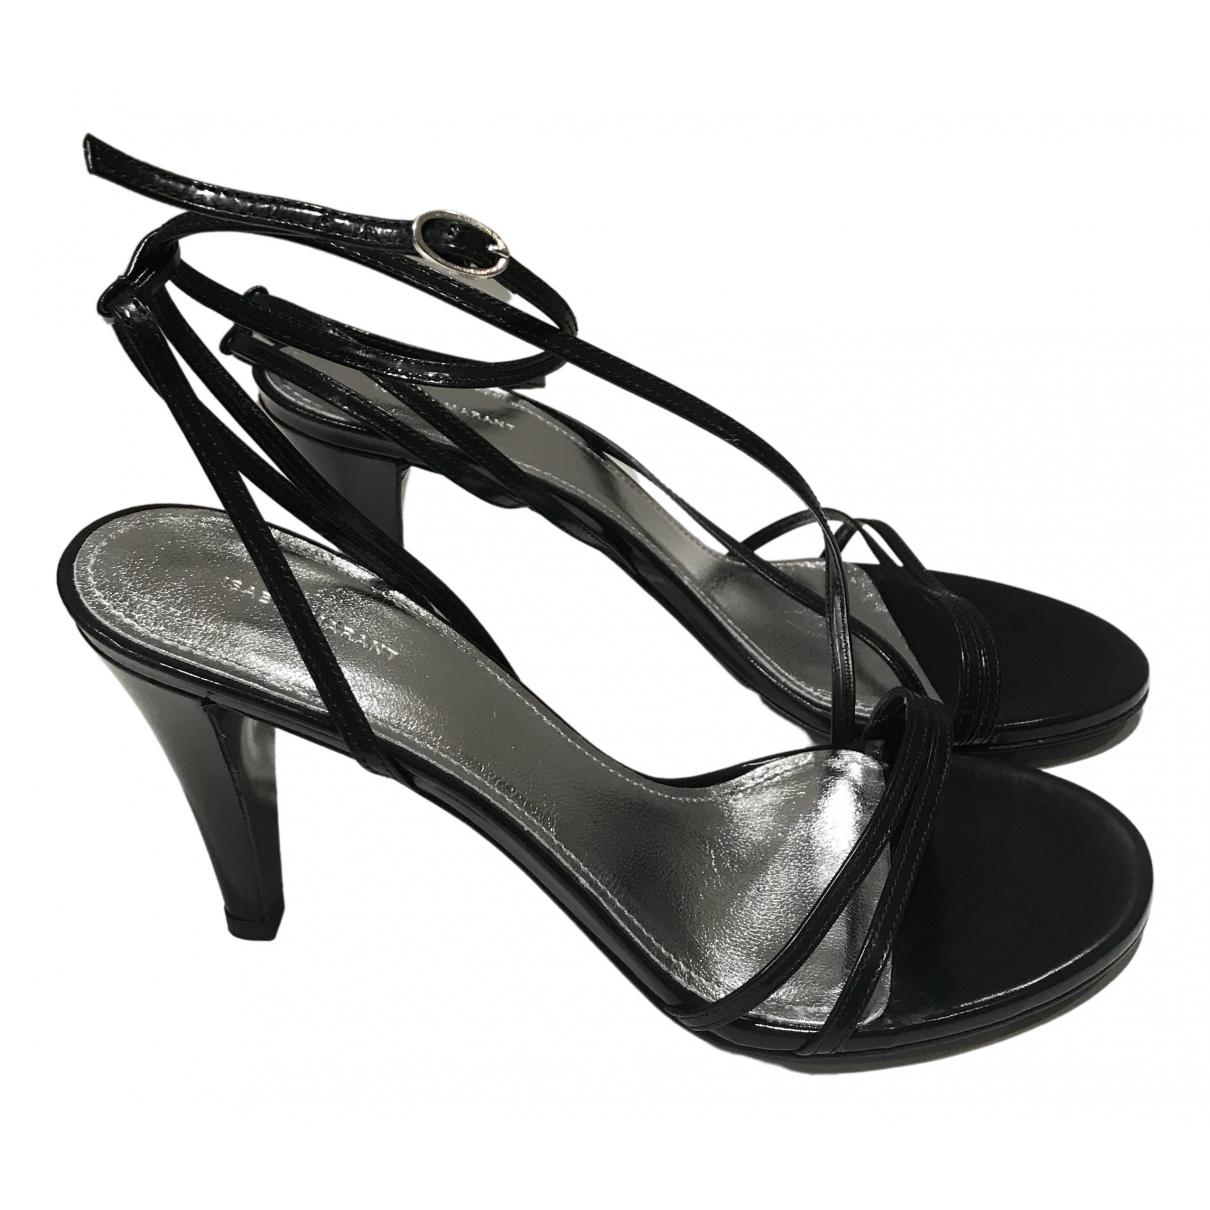 Isabel Marant \N Black Leather Sandals for Women 37 EU